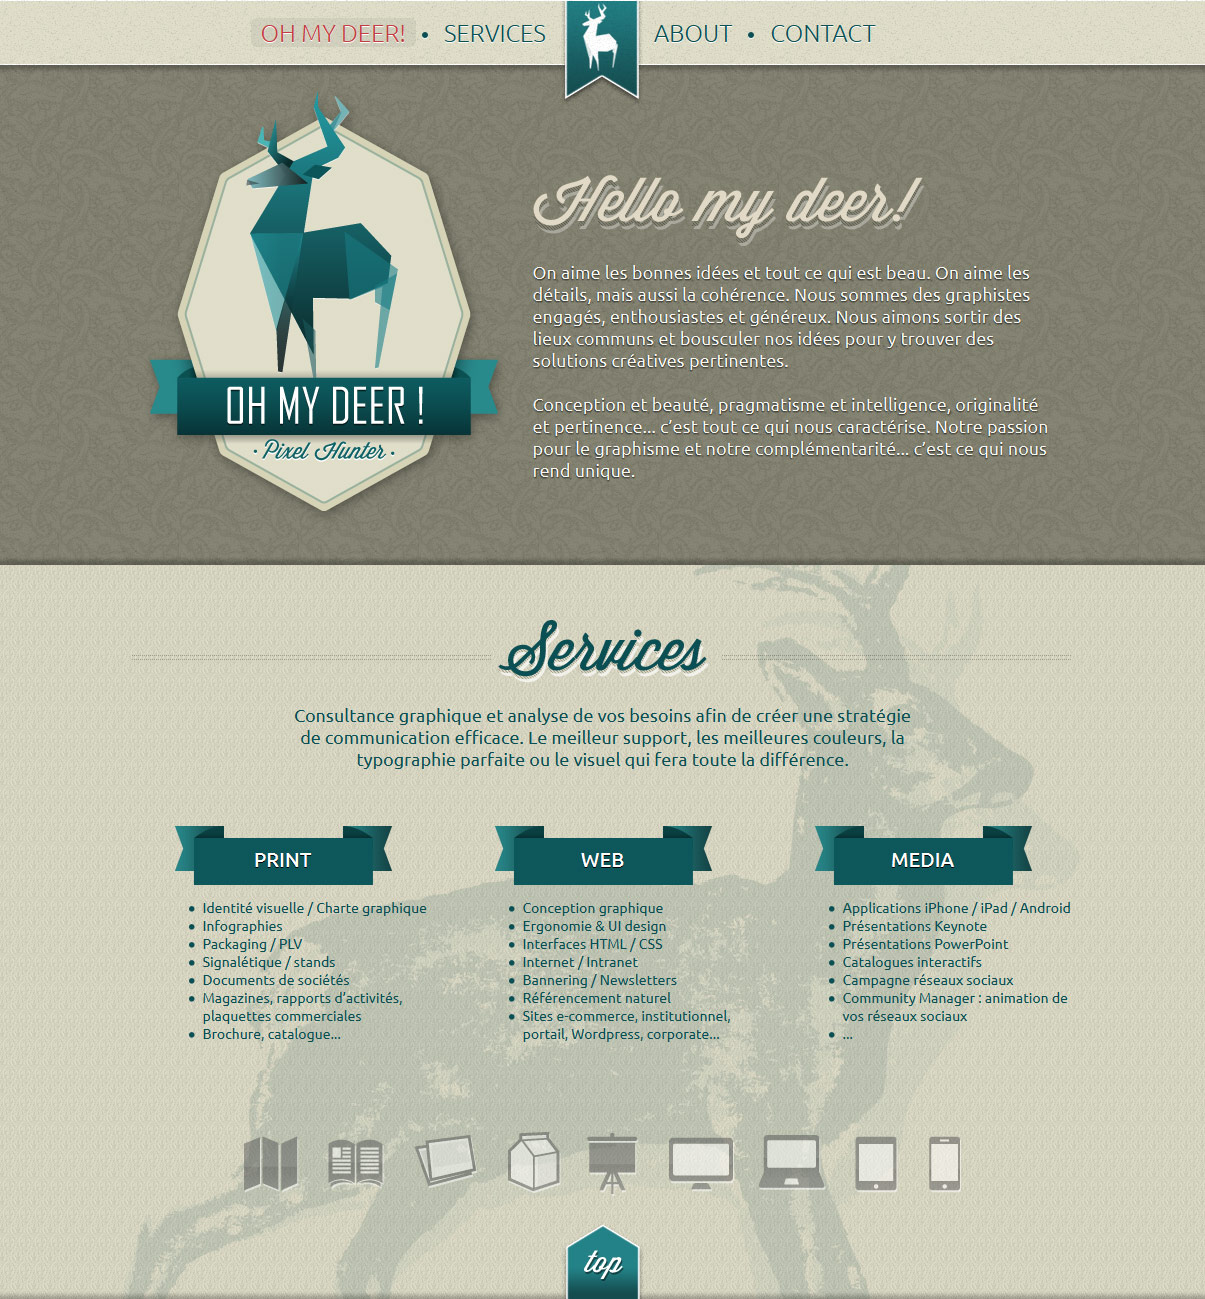 Oh my deer! Website Screenshot